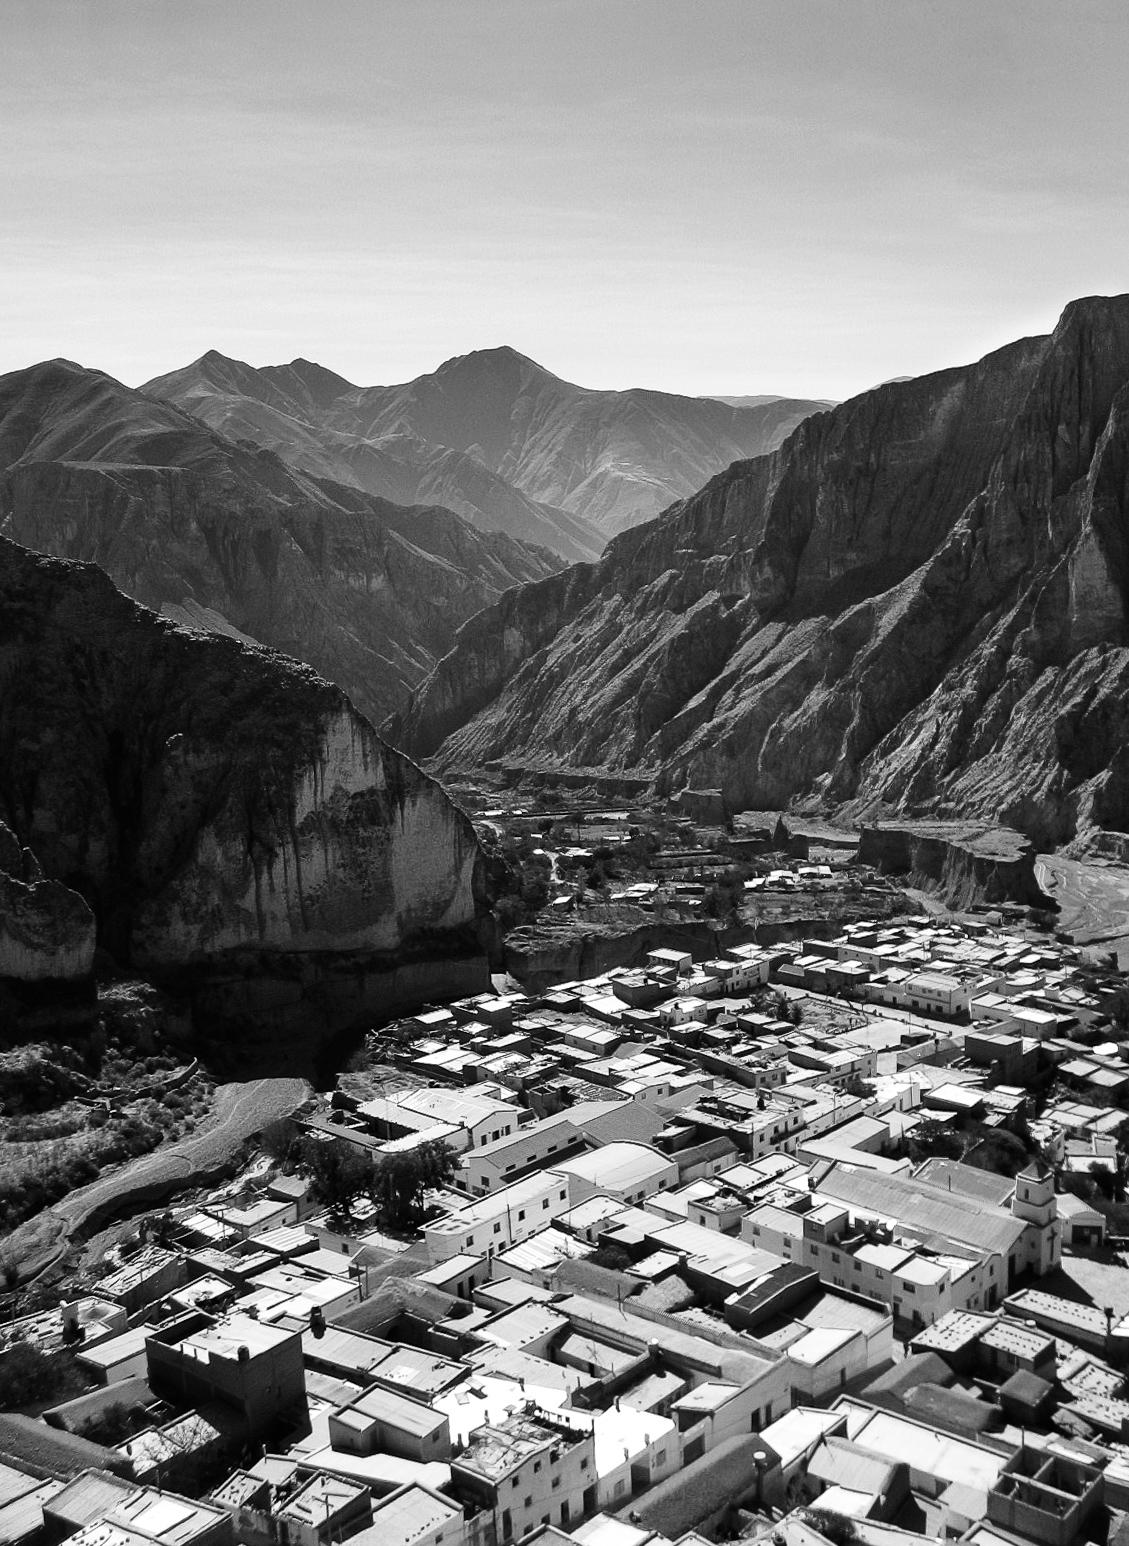 iruya-department_iruya-1747-town-valley.jpg